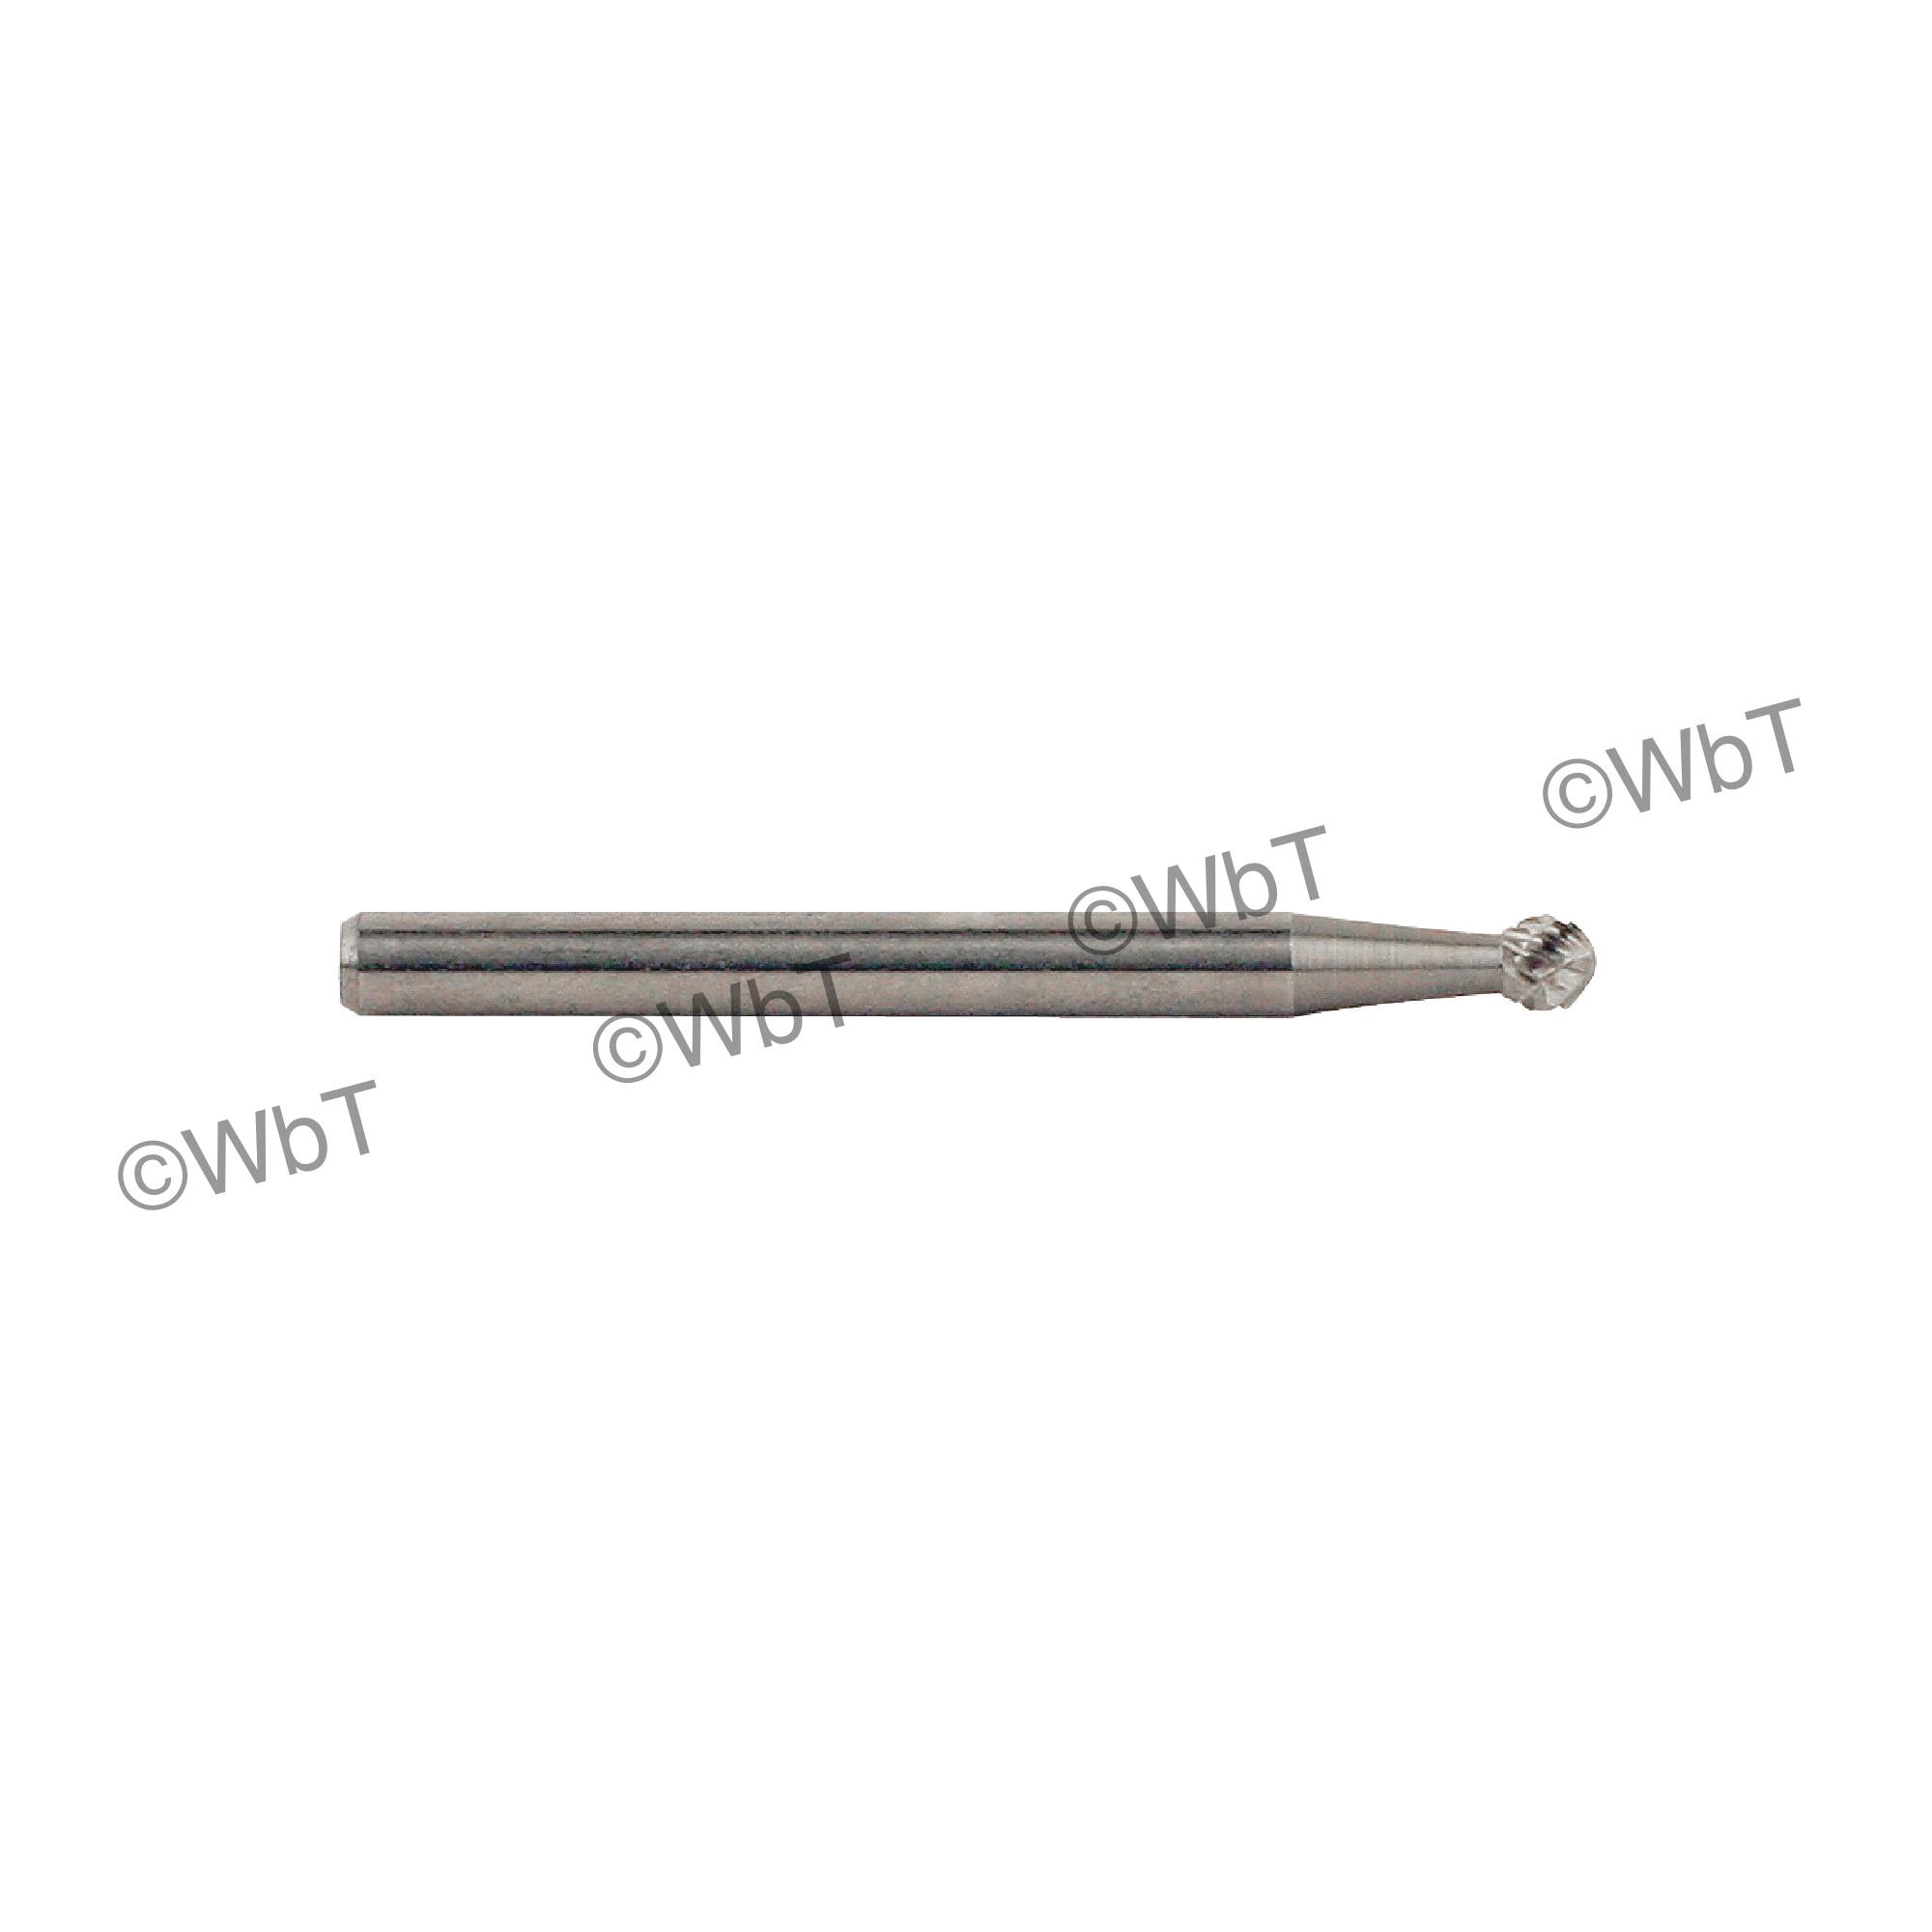 TTC 20-021-105 General Purpose Carbide Burr, Radius End, Taper Radius (Shape SL) Head, 1/4 in Dia Head, 5/8 in L of Cut, Standard Cut